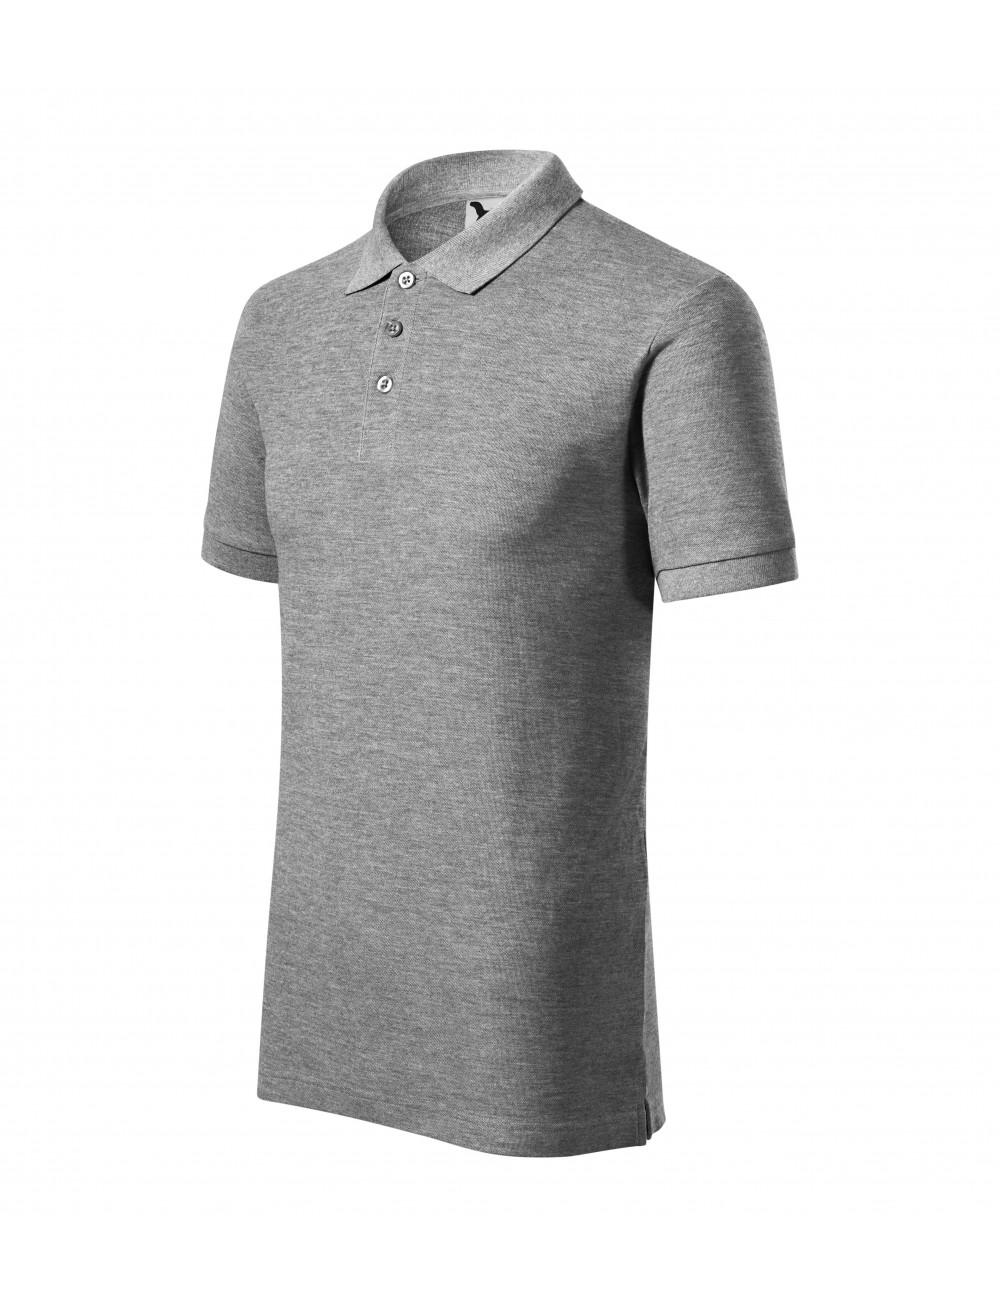 Adler MALFINI Koszulka polo męska Cotton Heavy 215 ciemnoszary melanż